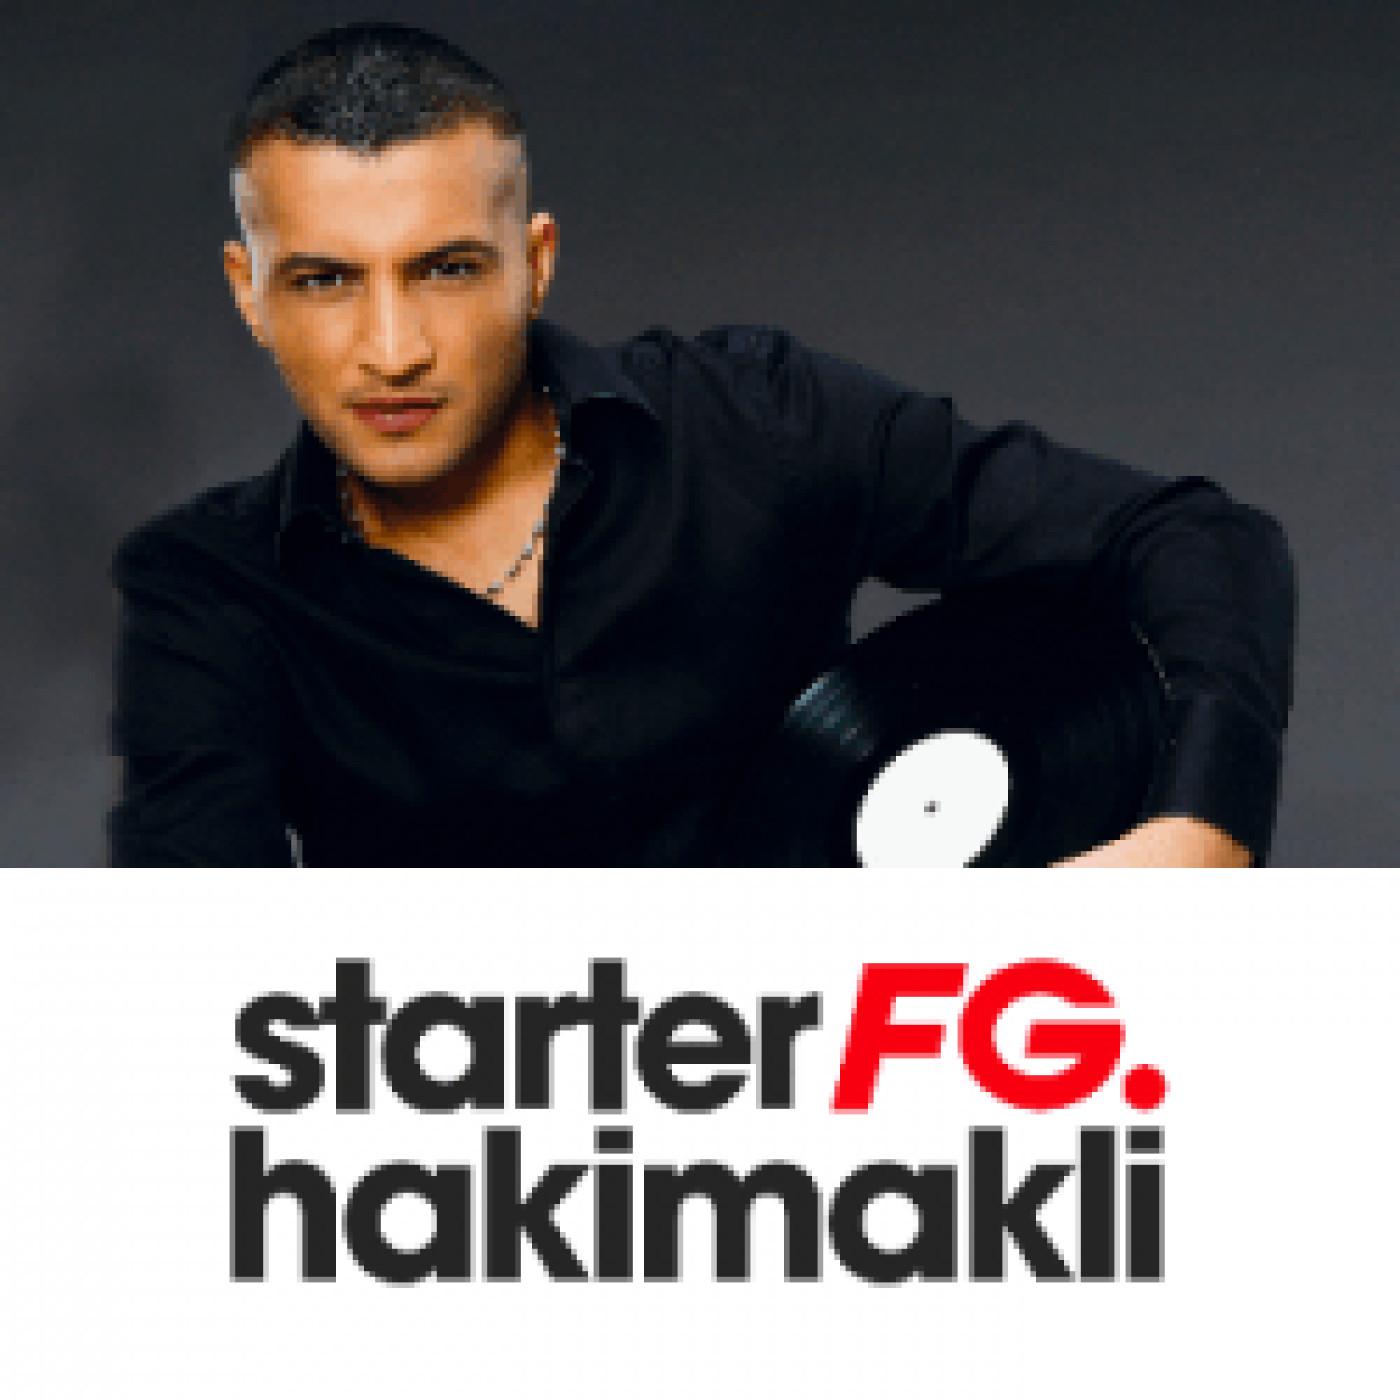 STARTER FG BY HAKIMAKLI MERCREDI 21 OCTOBRE 2020